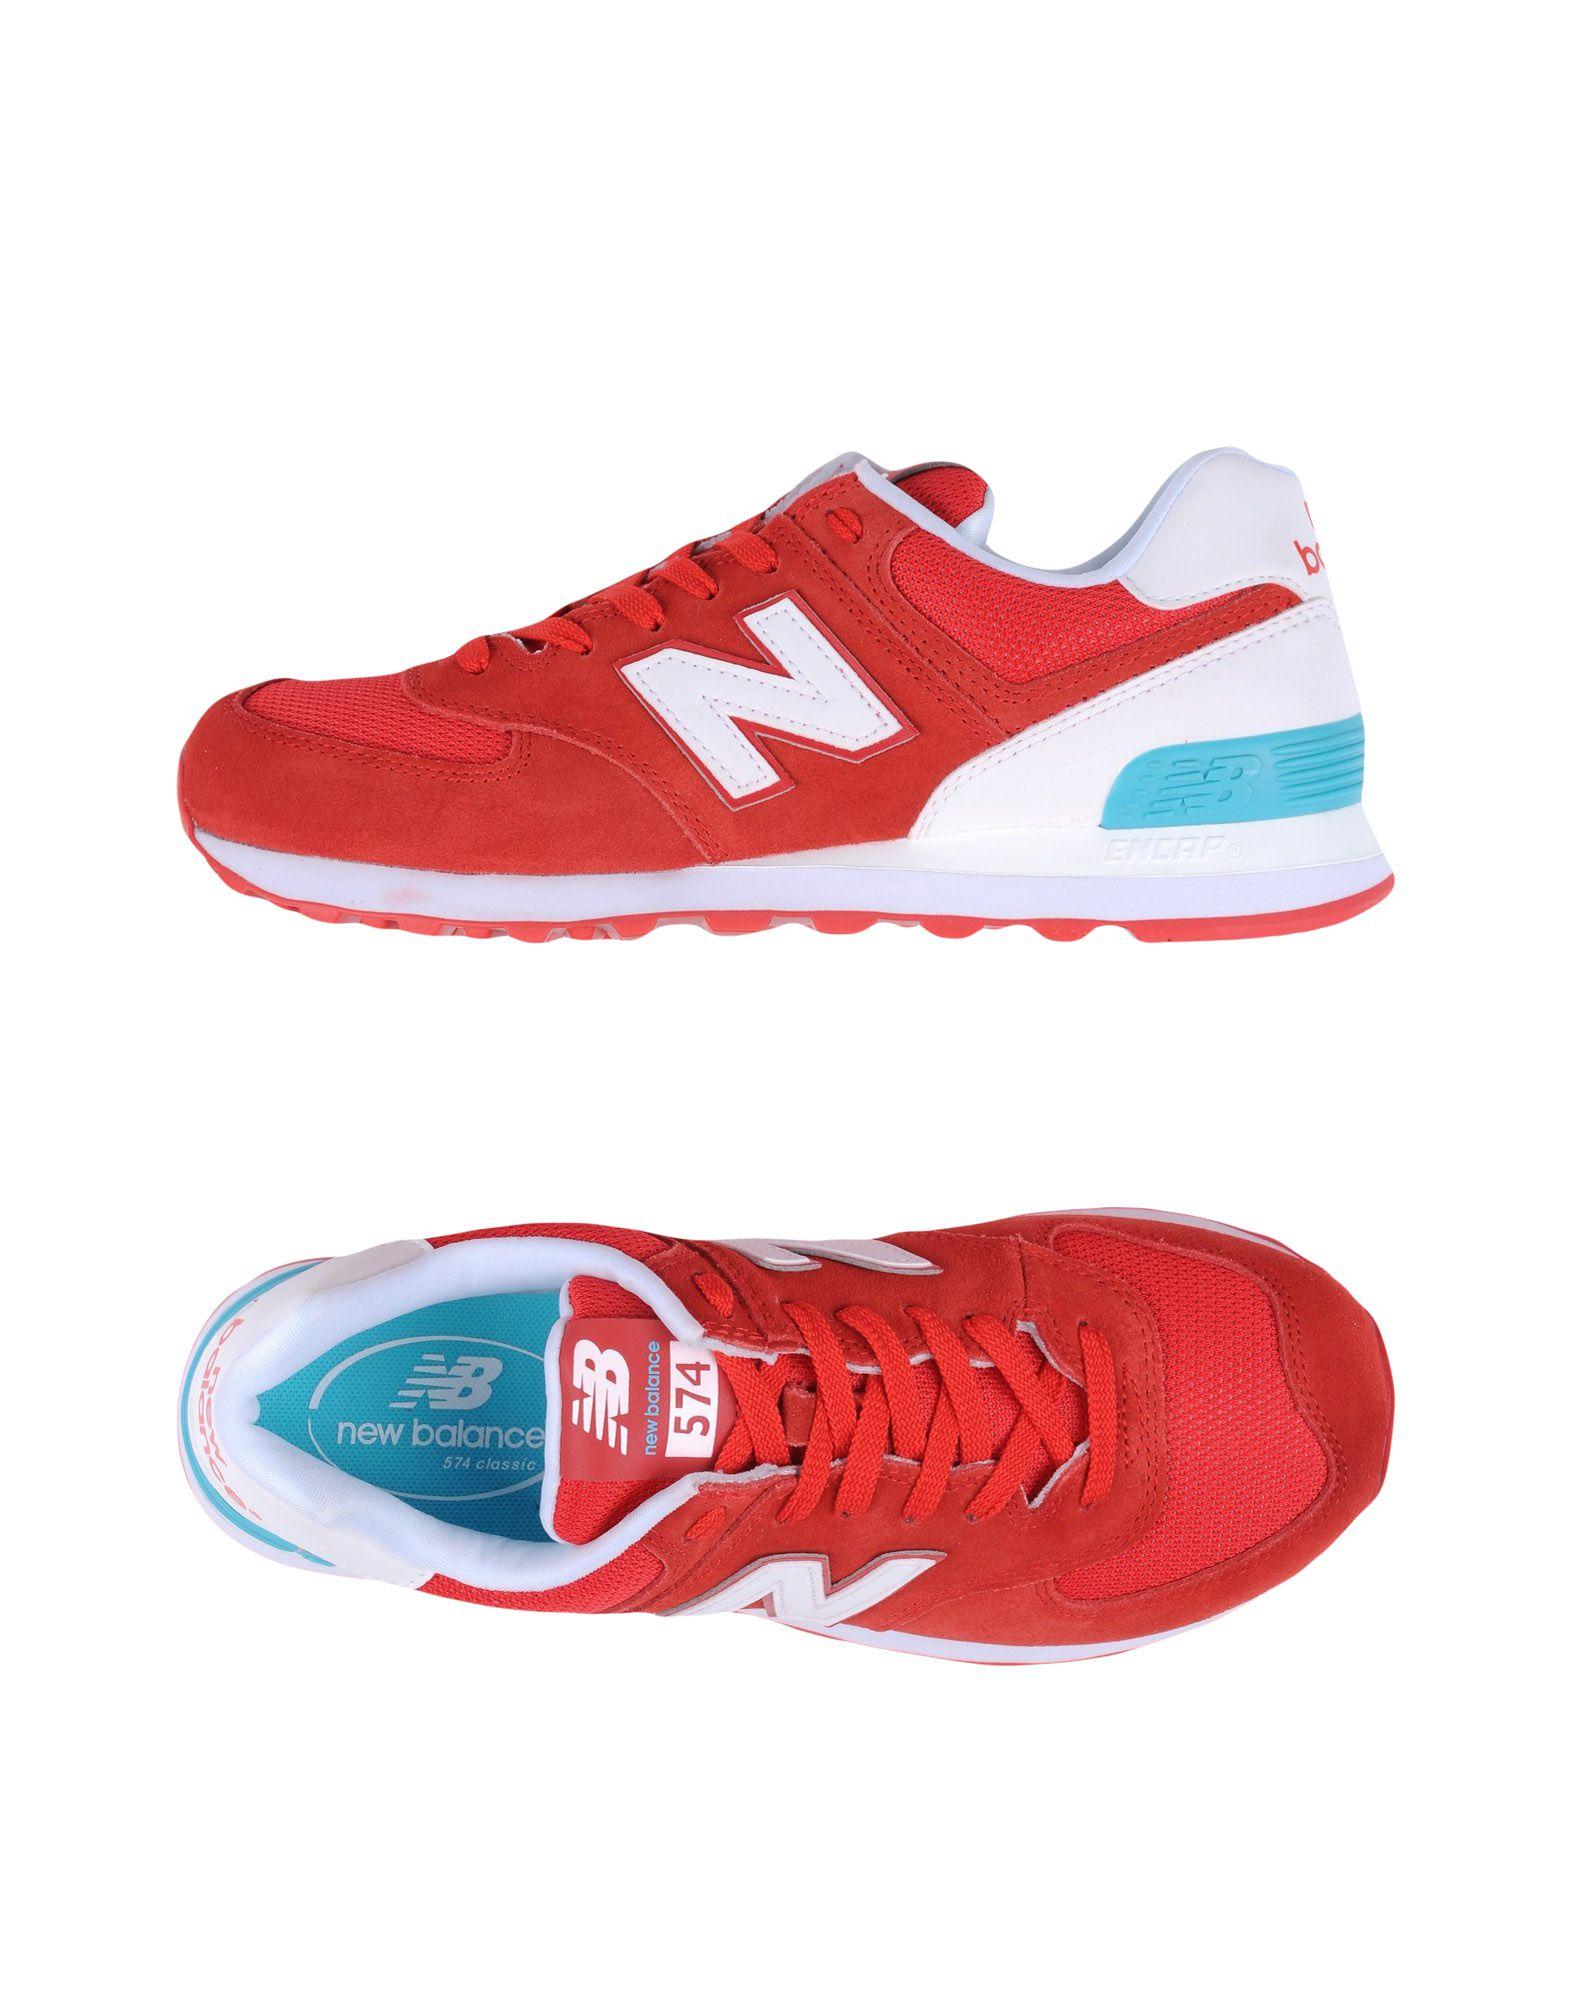 Sneakers New Balance 574 Suede Mesh Seasonal - Donna - 11195912EU